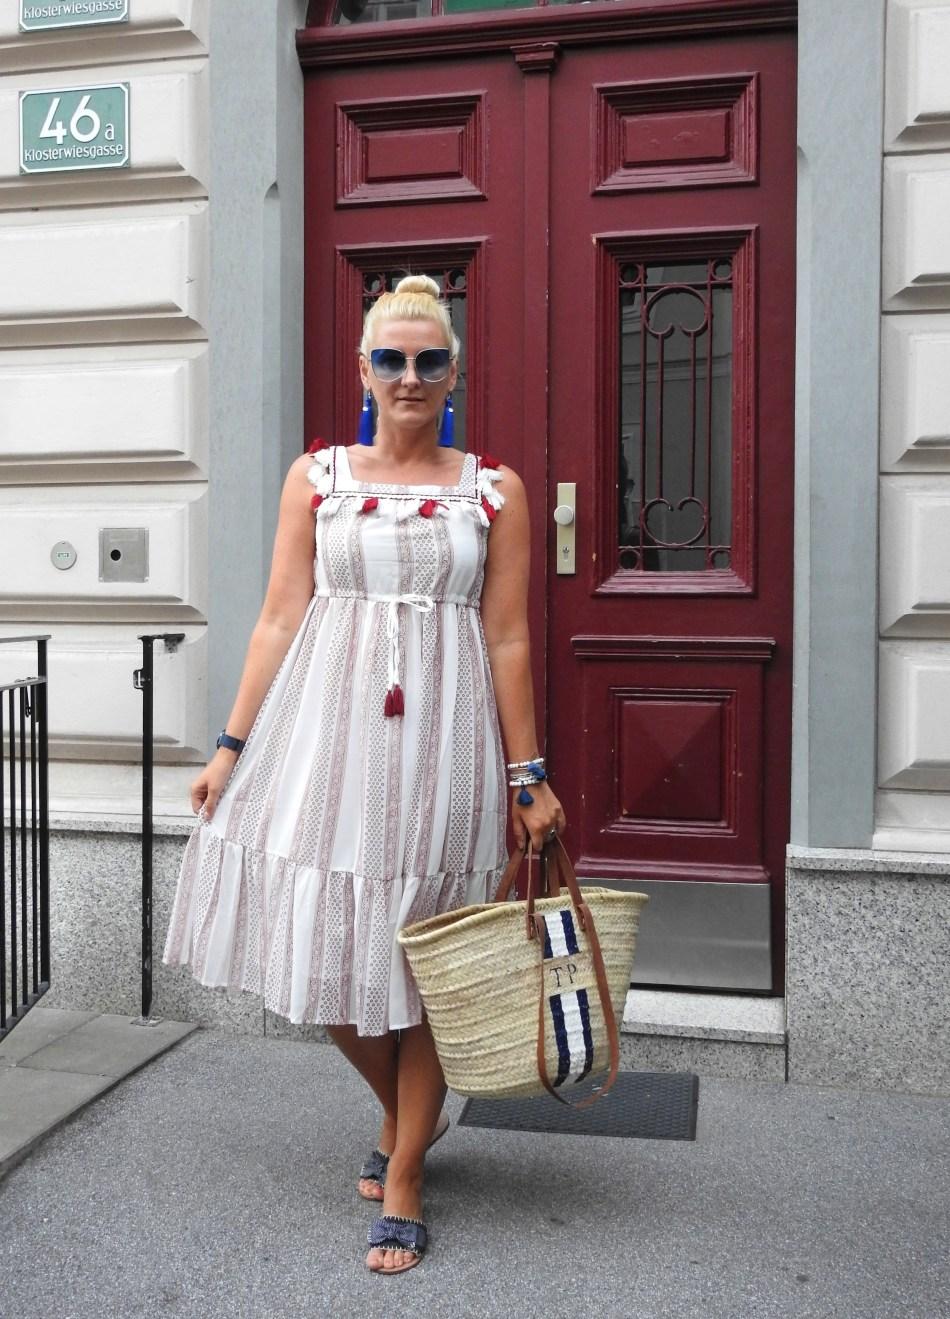 Tassels-Summer-Dress-Embroidered-Korb-Bag-carrieslifestyle-Tamara-Prutsch